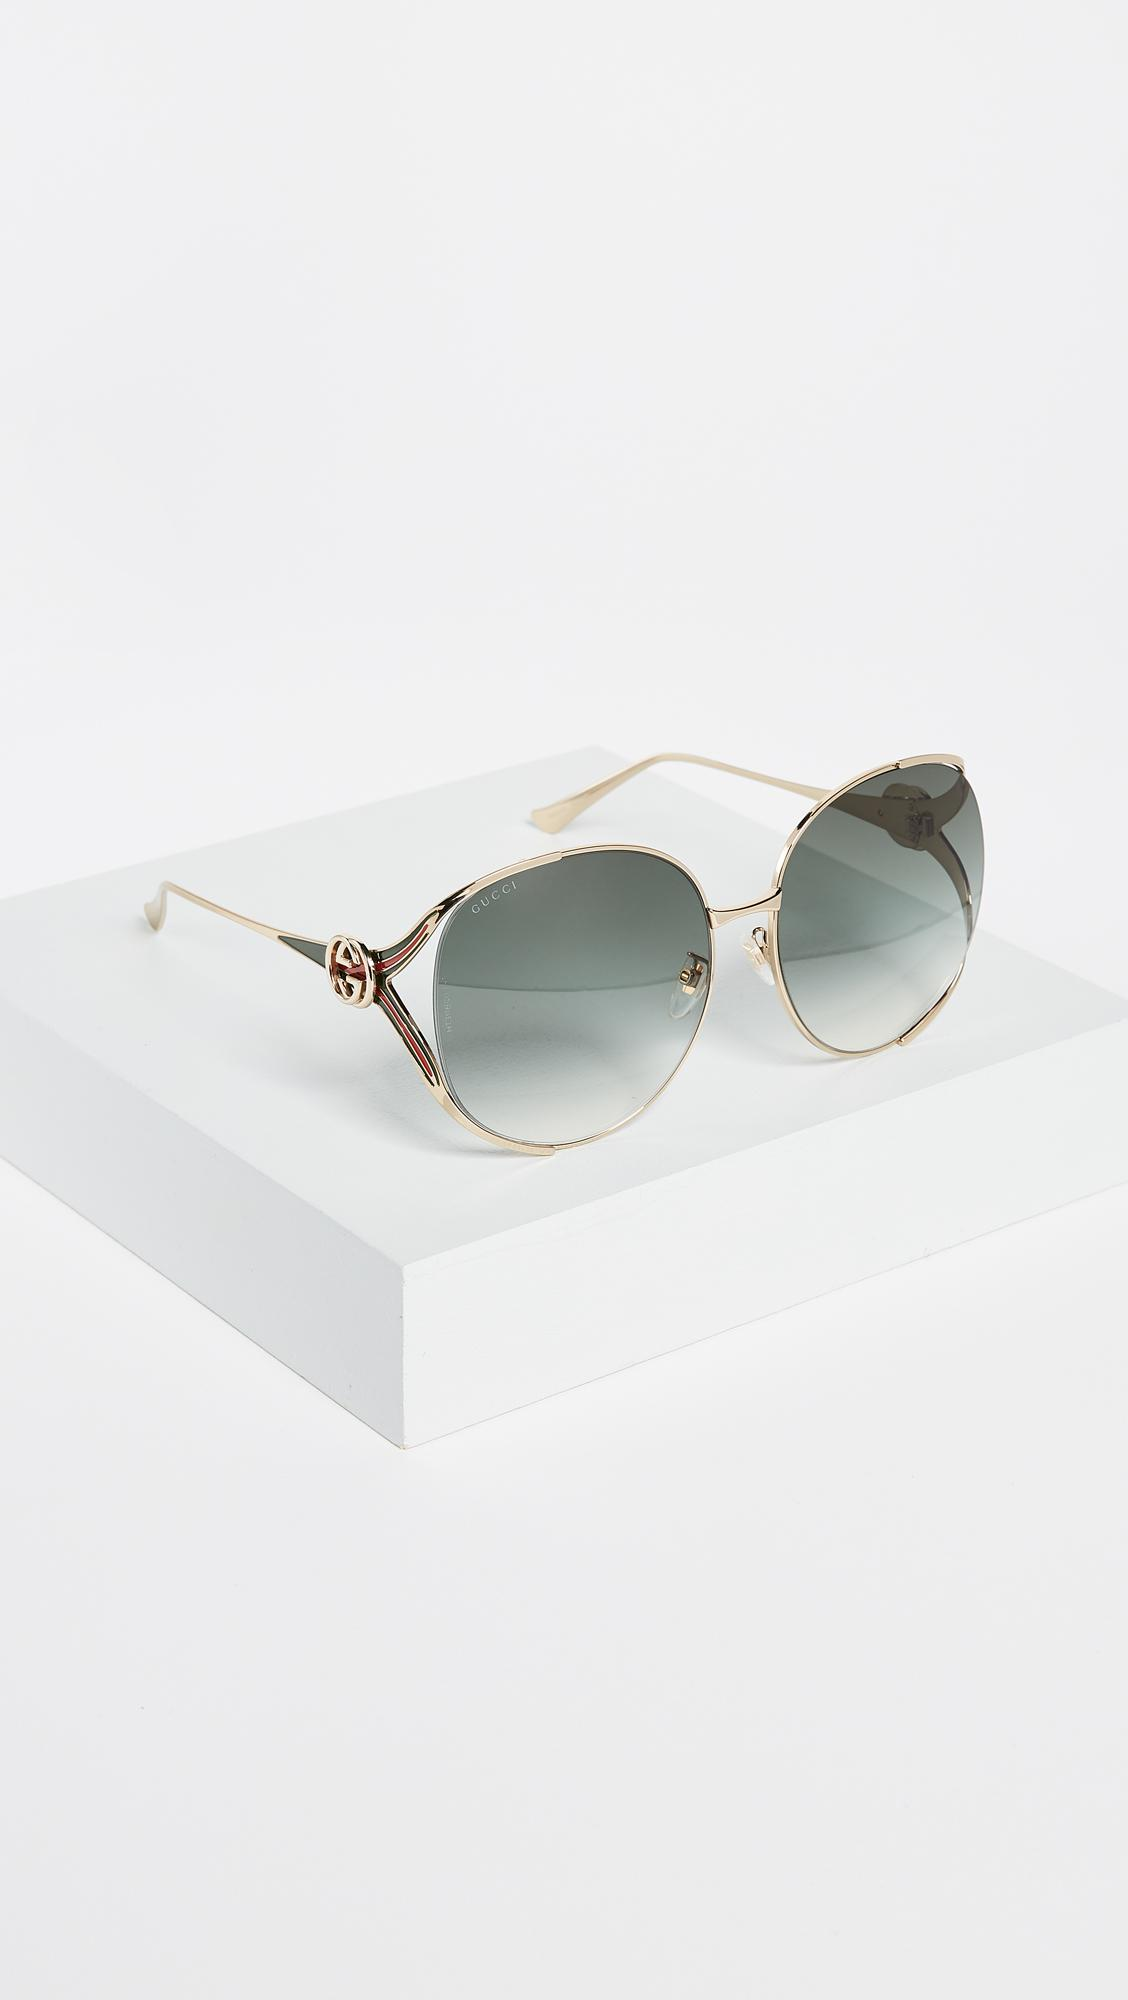 4c21a6c452f5 Lyst - Gucci Urban Folk Oval Sunglasses